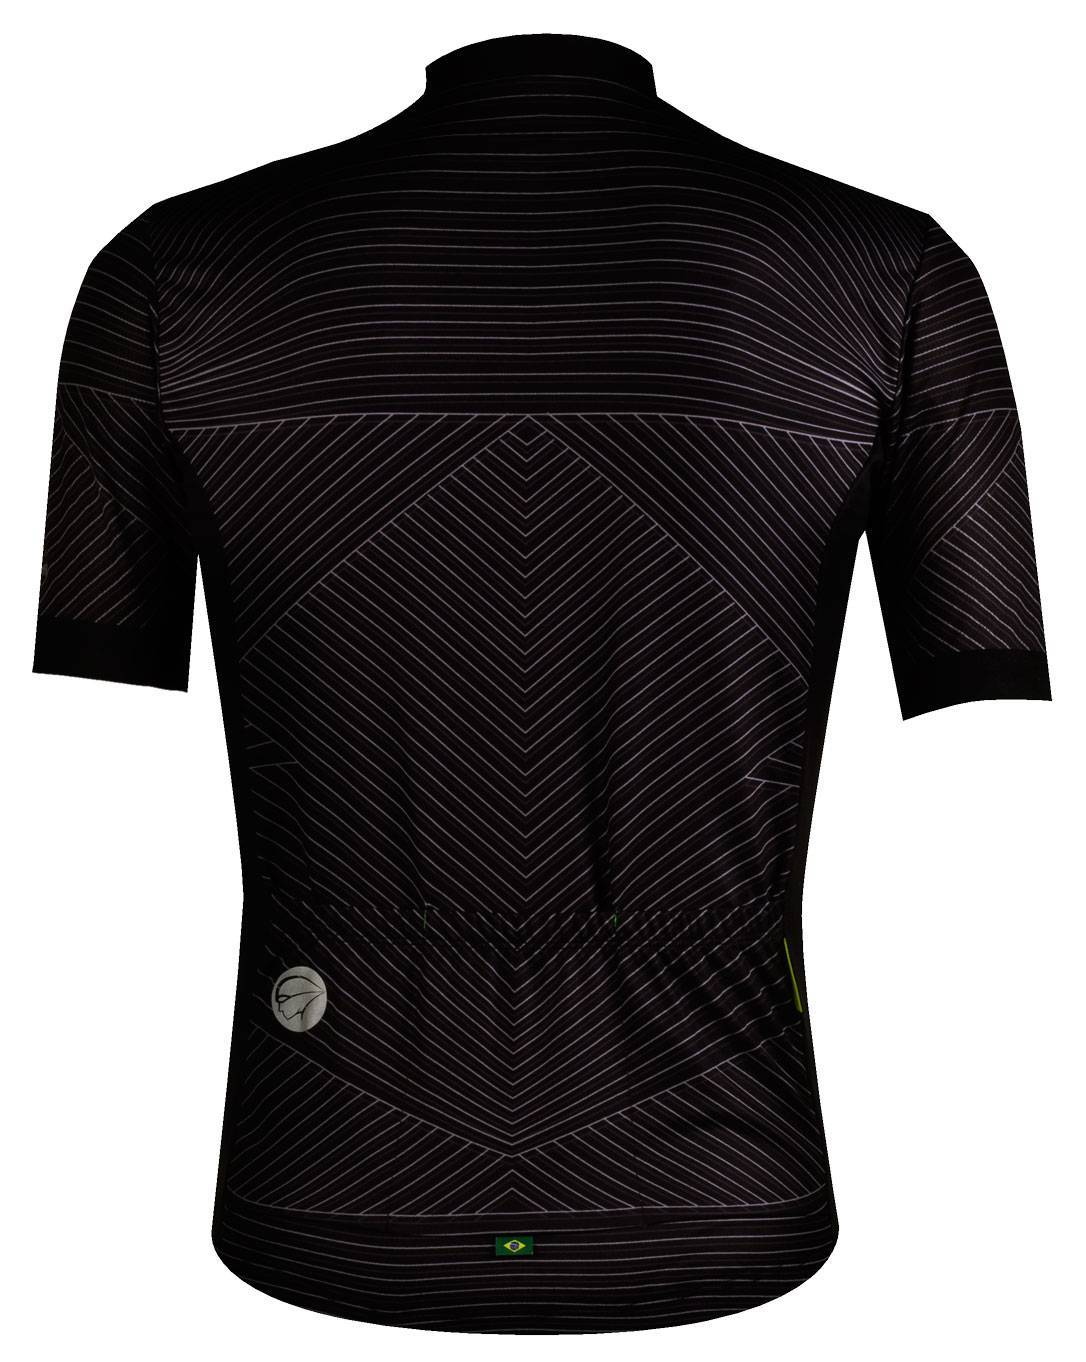 Camisa Mauro Ribeiro Range 2019 - BIKE ALLA CARTE